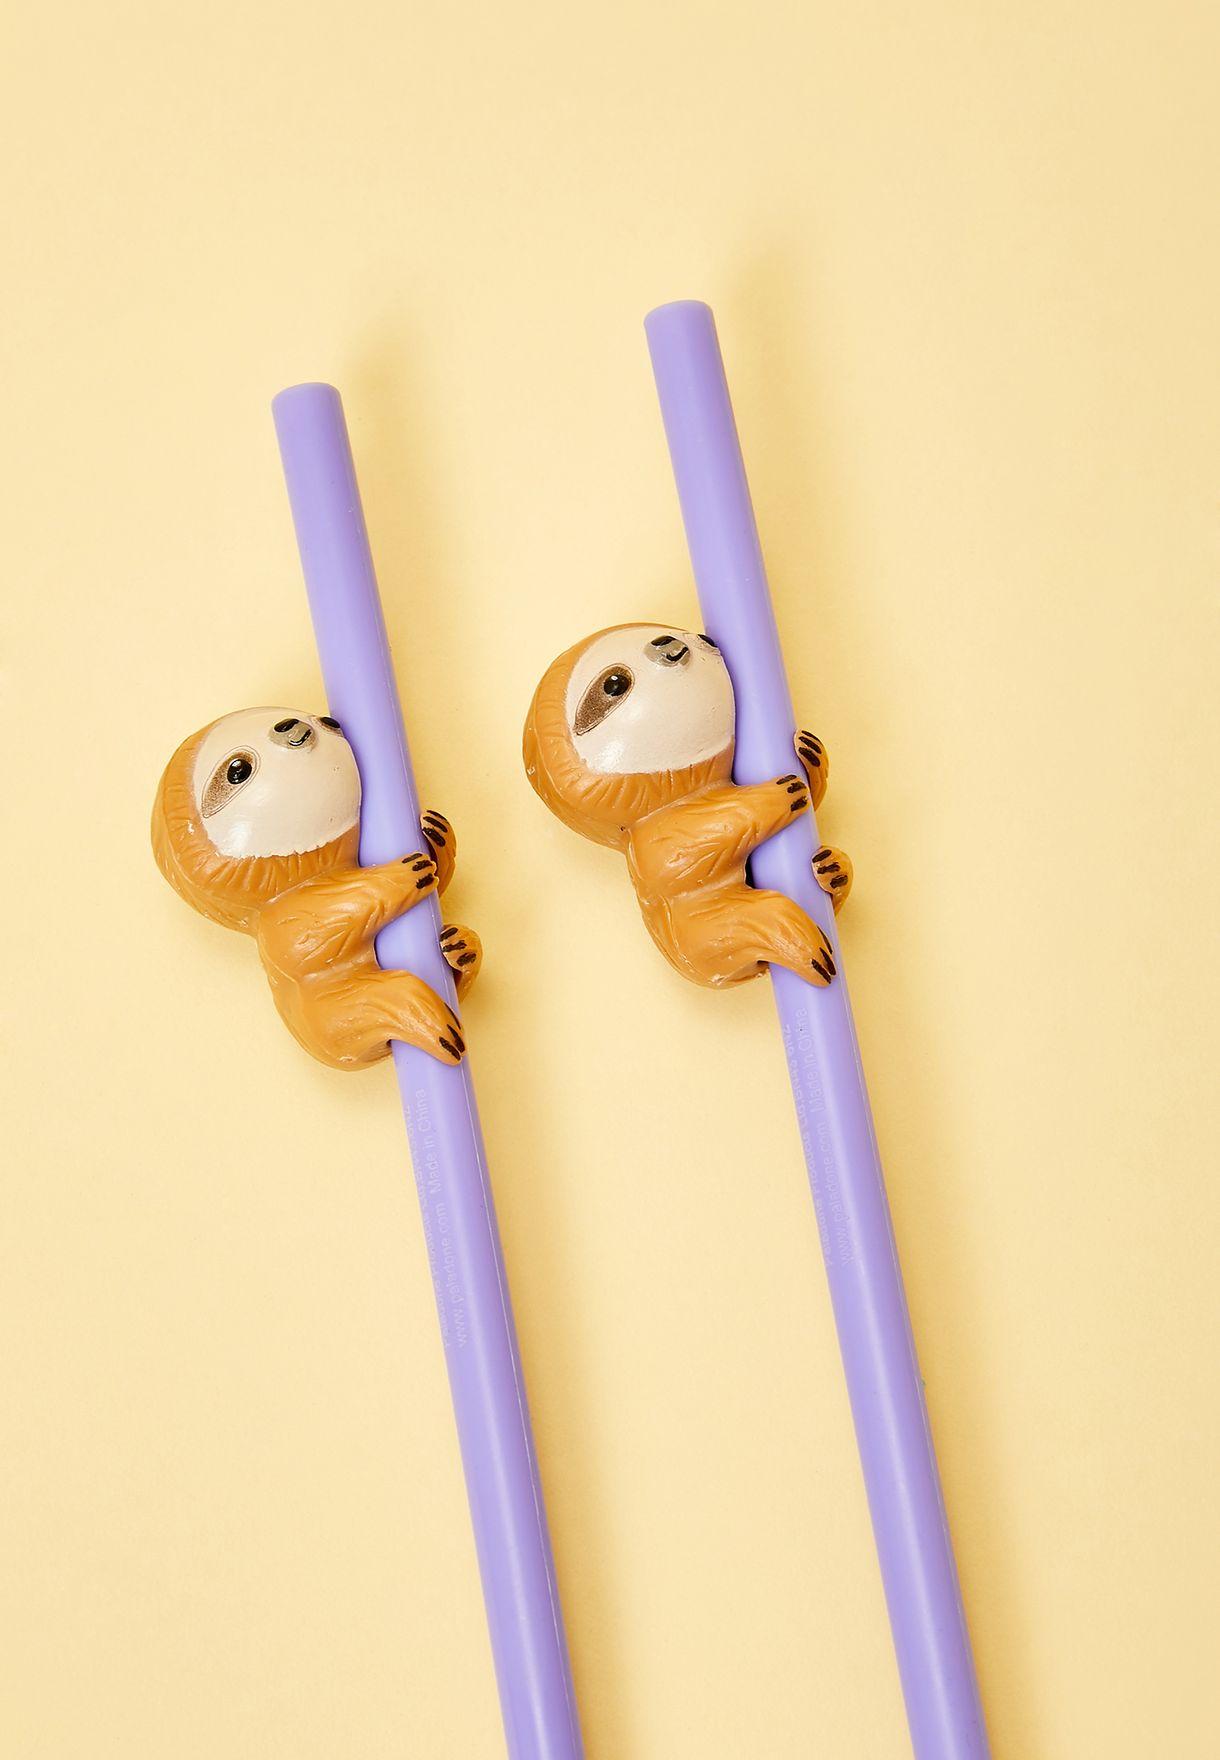 Set of 2 Sloth Straws